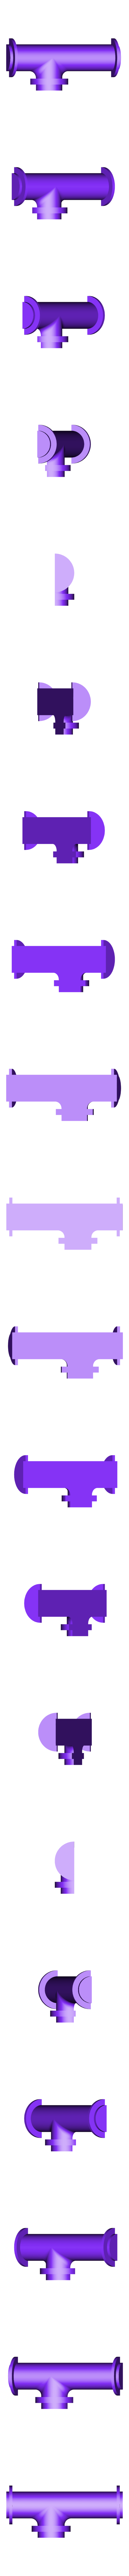 Steam_Pipe_T_pipe-a.STL Download free STL file 4-8-8-4 Big Boy Locomotive • 3D printer object, RaymondDeLuca